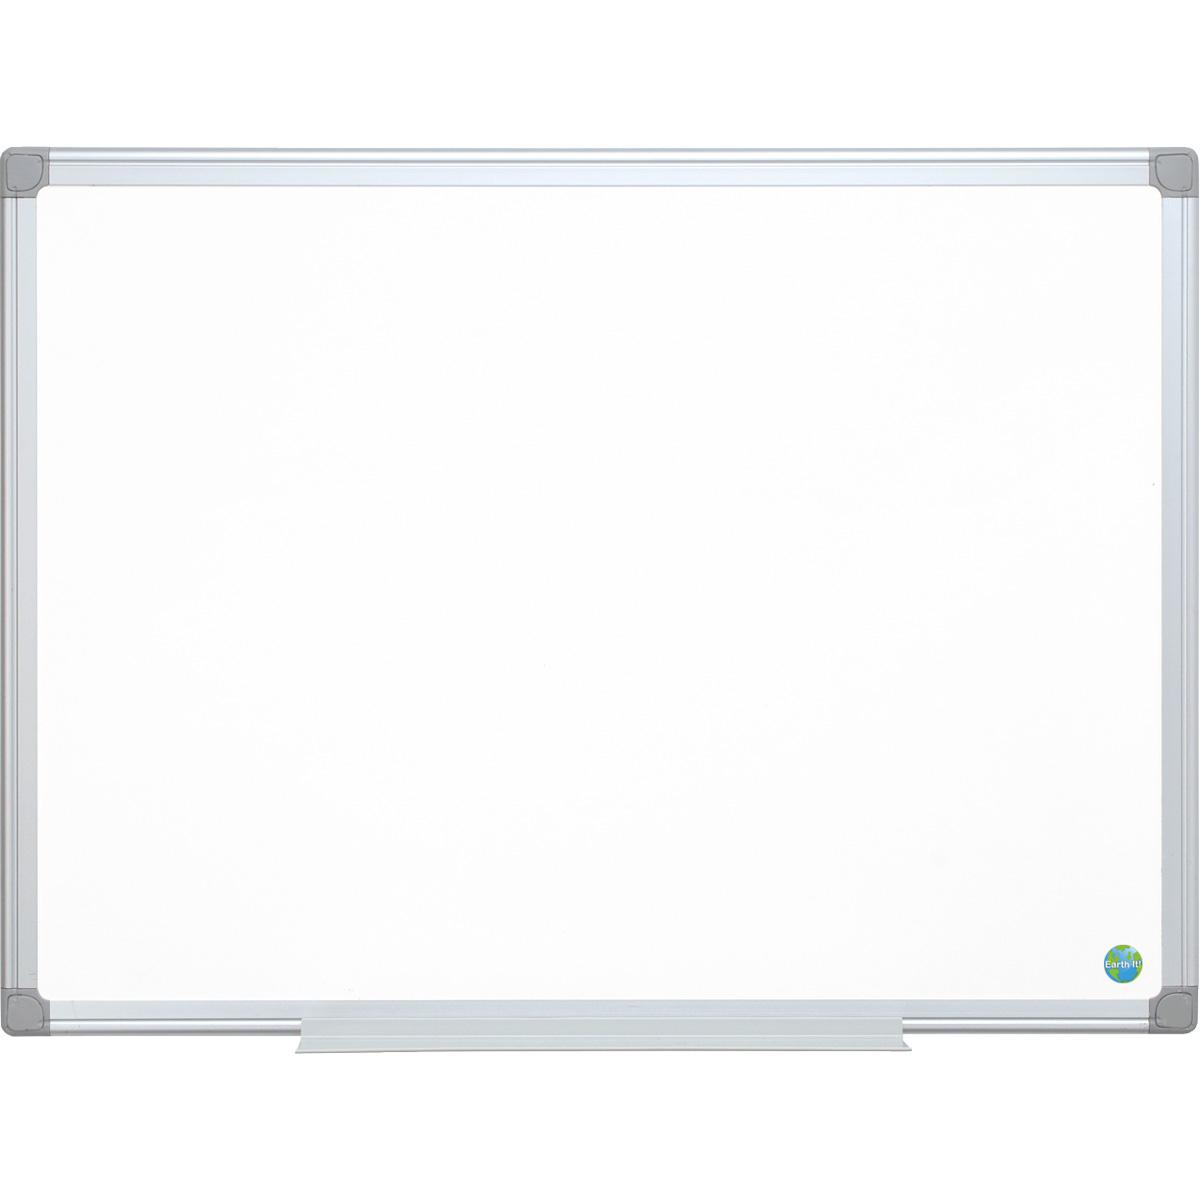 Whiteboard Earth-it 1500 x 1200 mm, Emailliert – Schäfer Shop Fundgrube